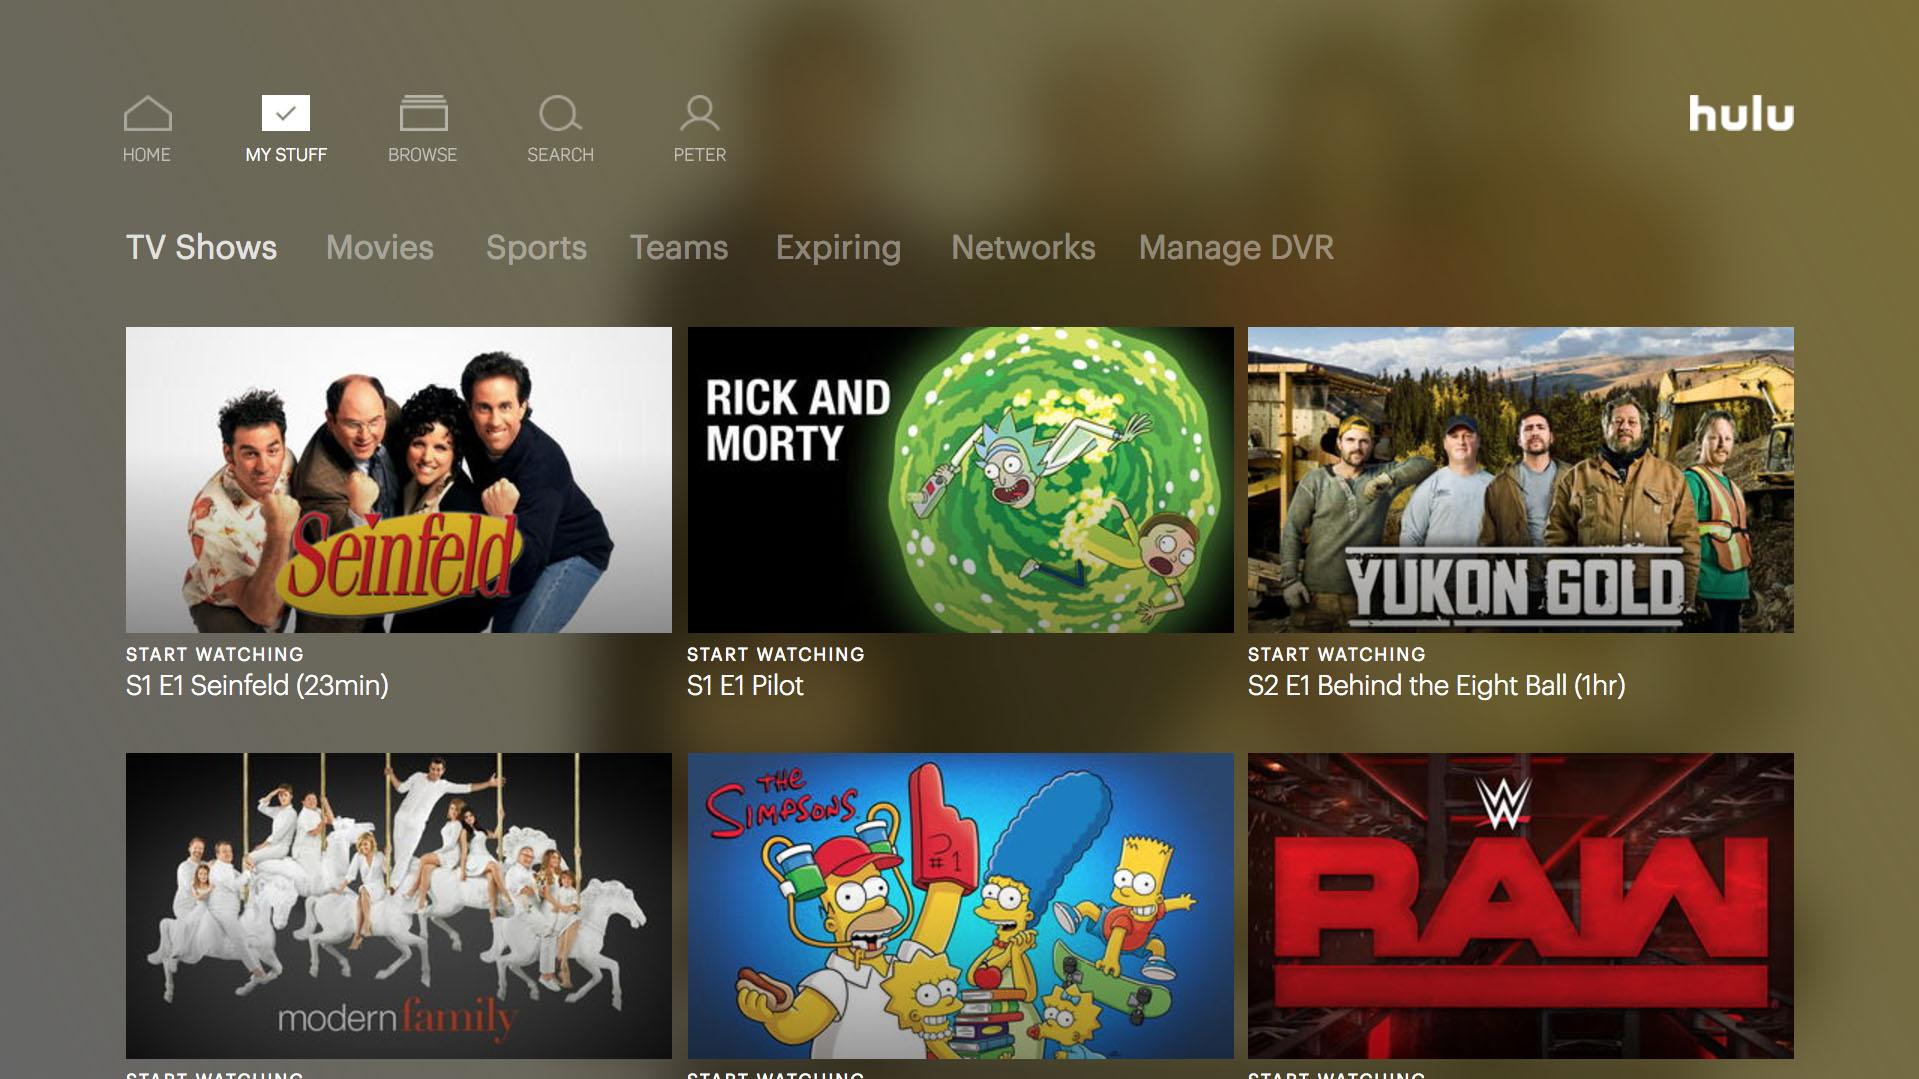 My Stuff On Hulu